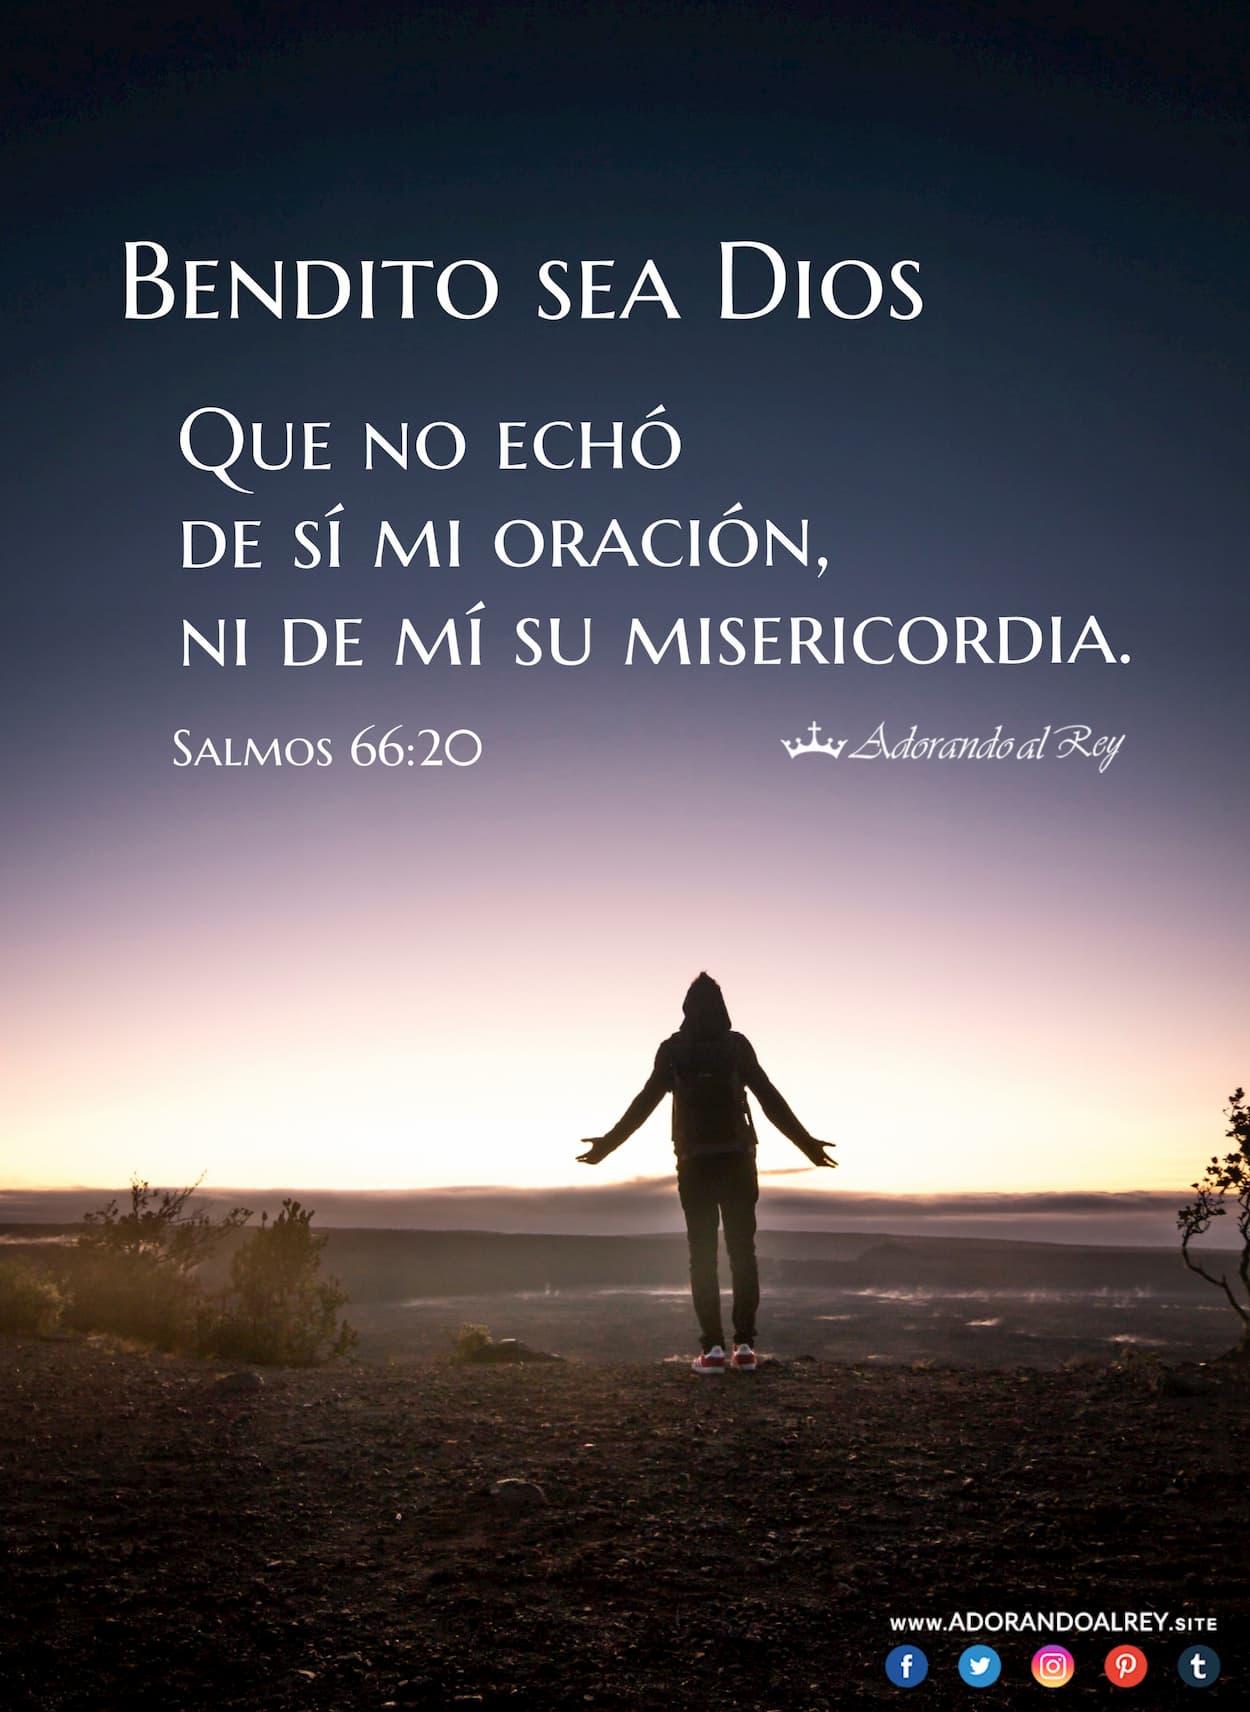 Salmo 66:20